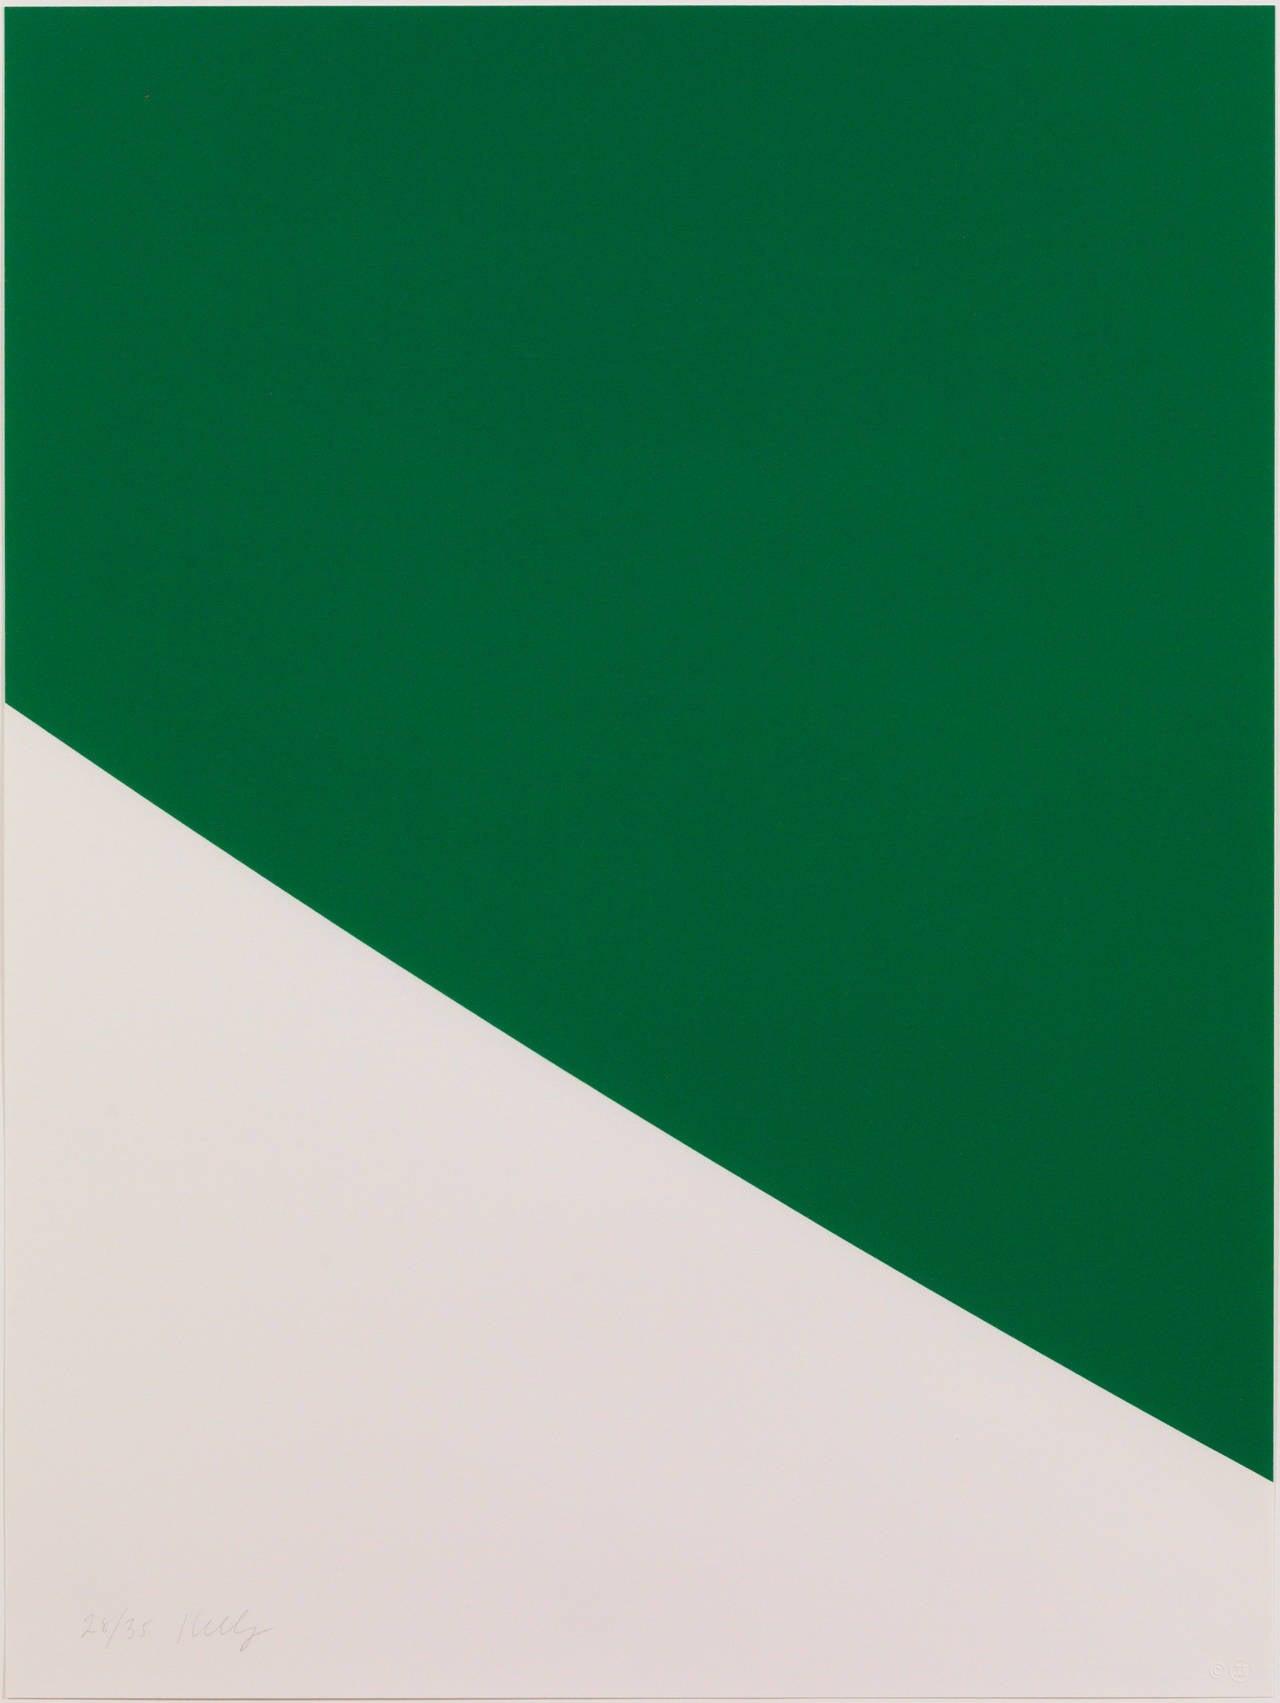 Green Curve - Print by Ellsworth Kelly